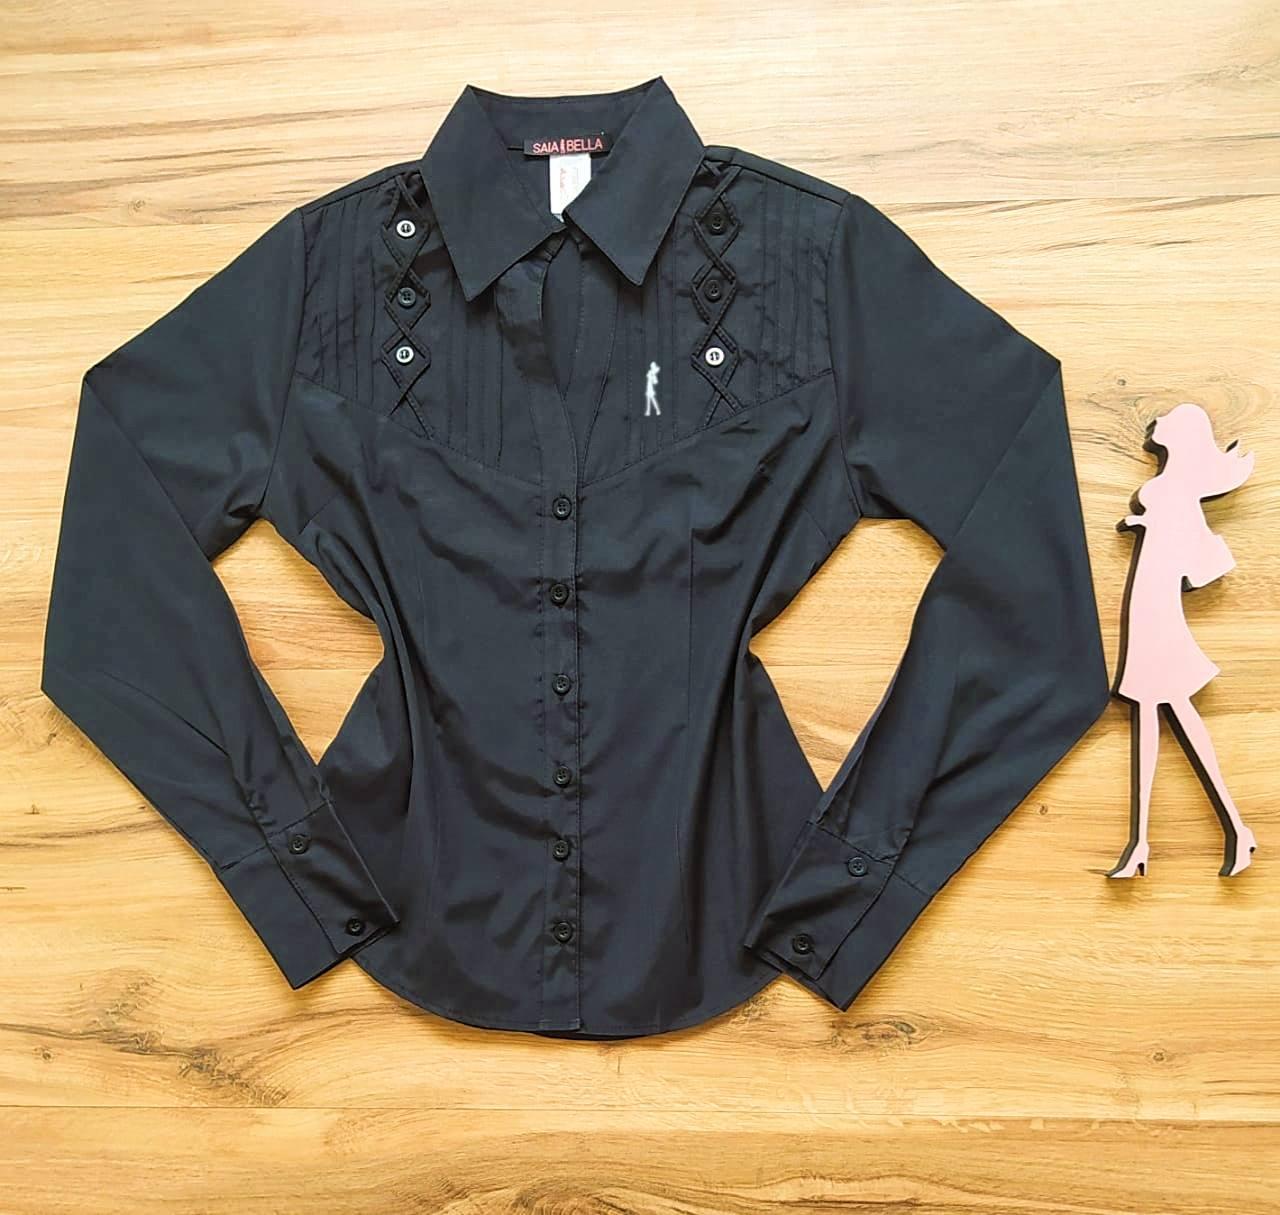 Camisa Ohana Manga Longa Saia Bella SB33181 Preto